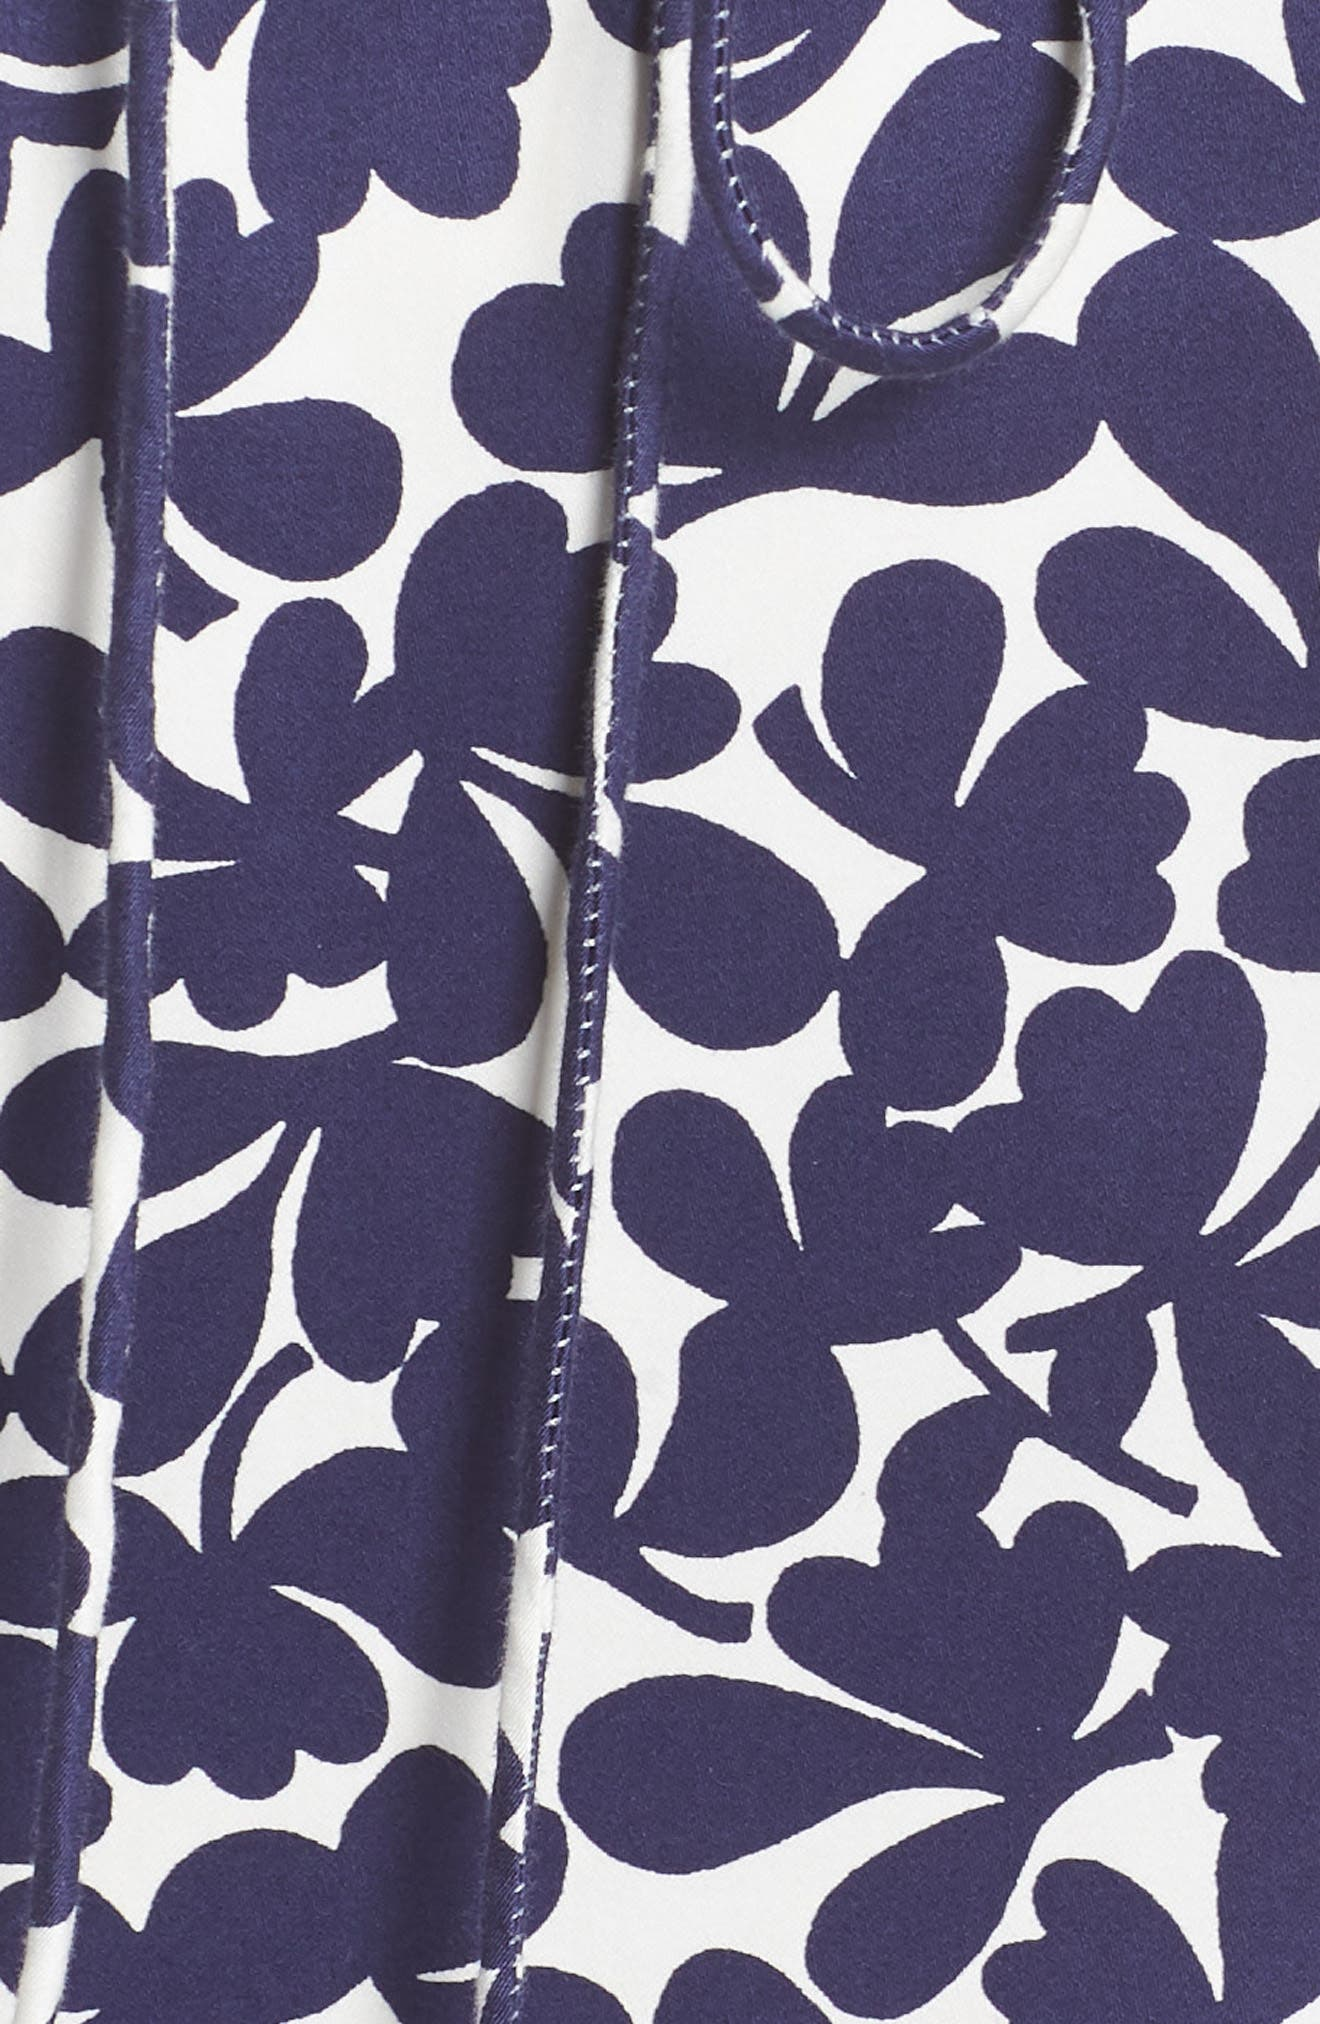 Lady Luck Print Cotton Sateen Dress,                             Alternate thumbnail 6, color,                             Navy/ Ivory